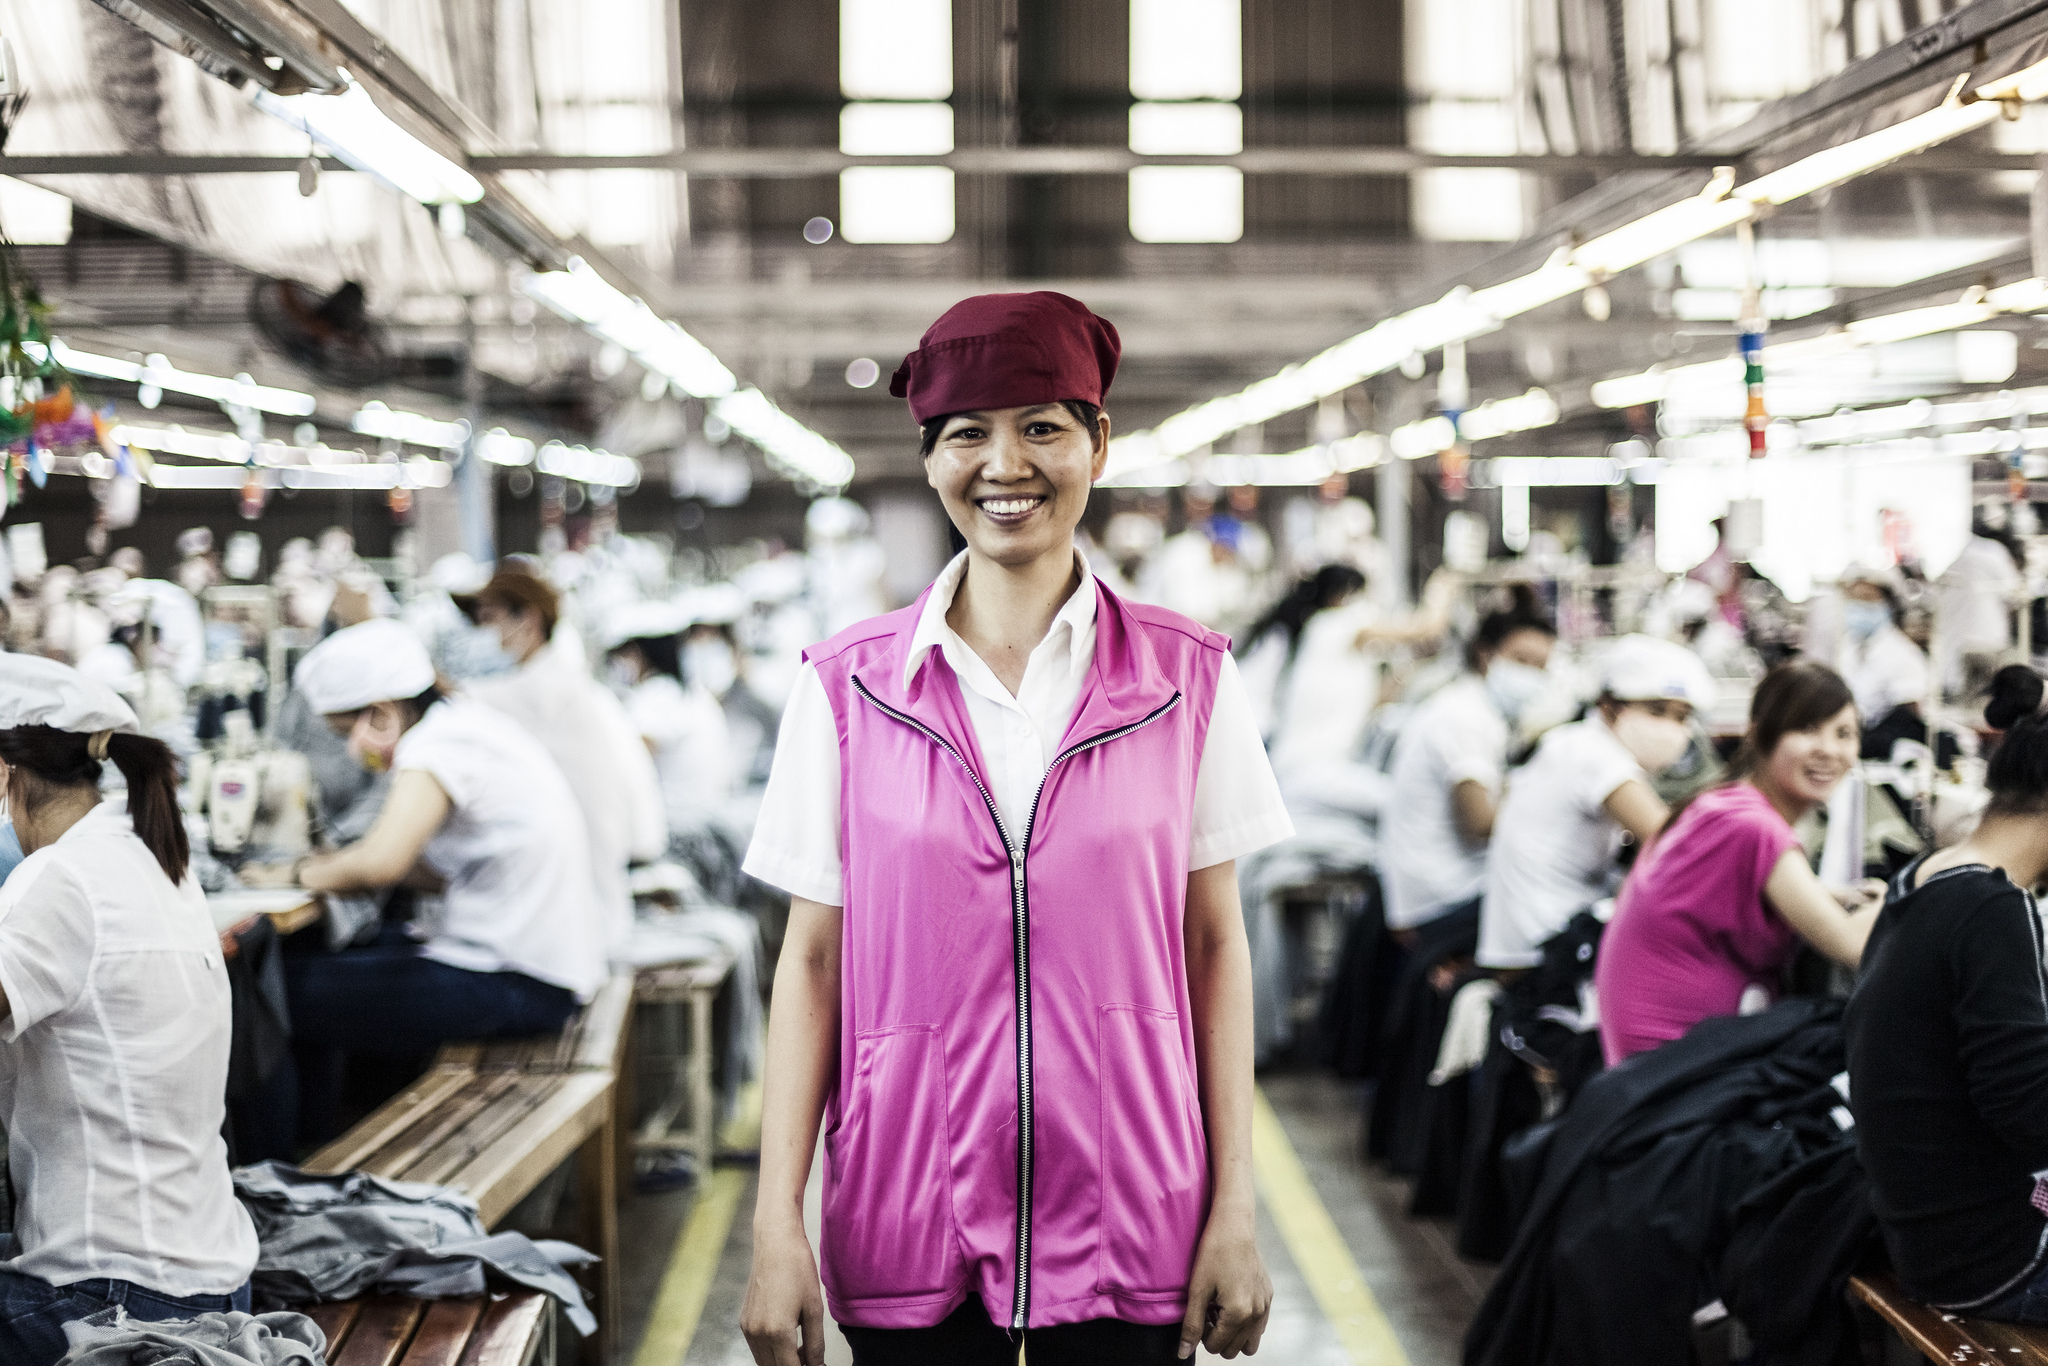 Ando International garment factory